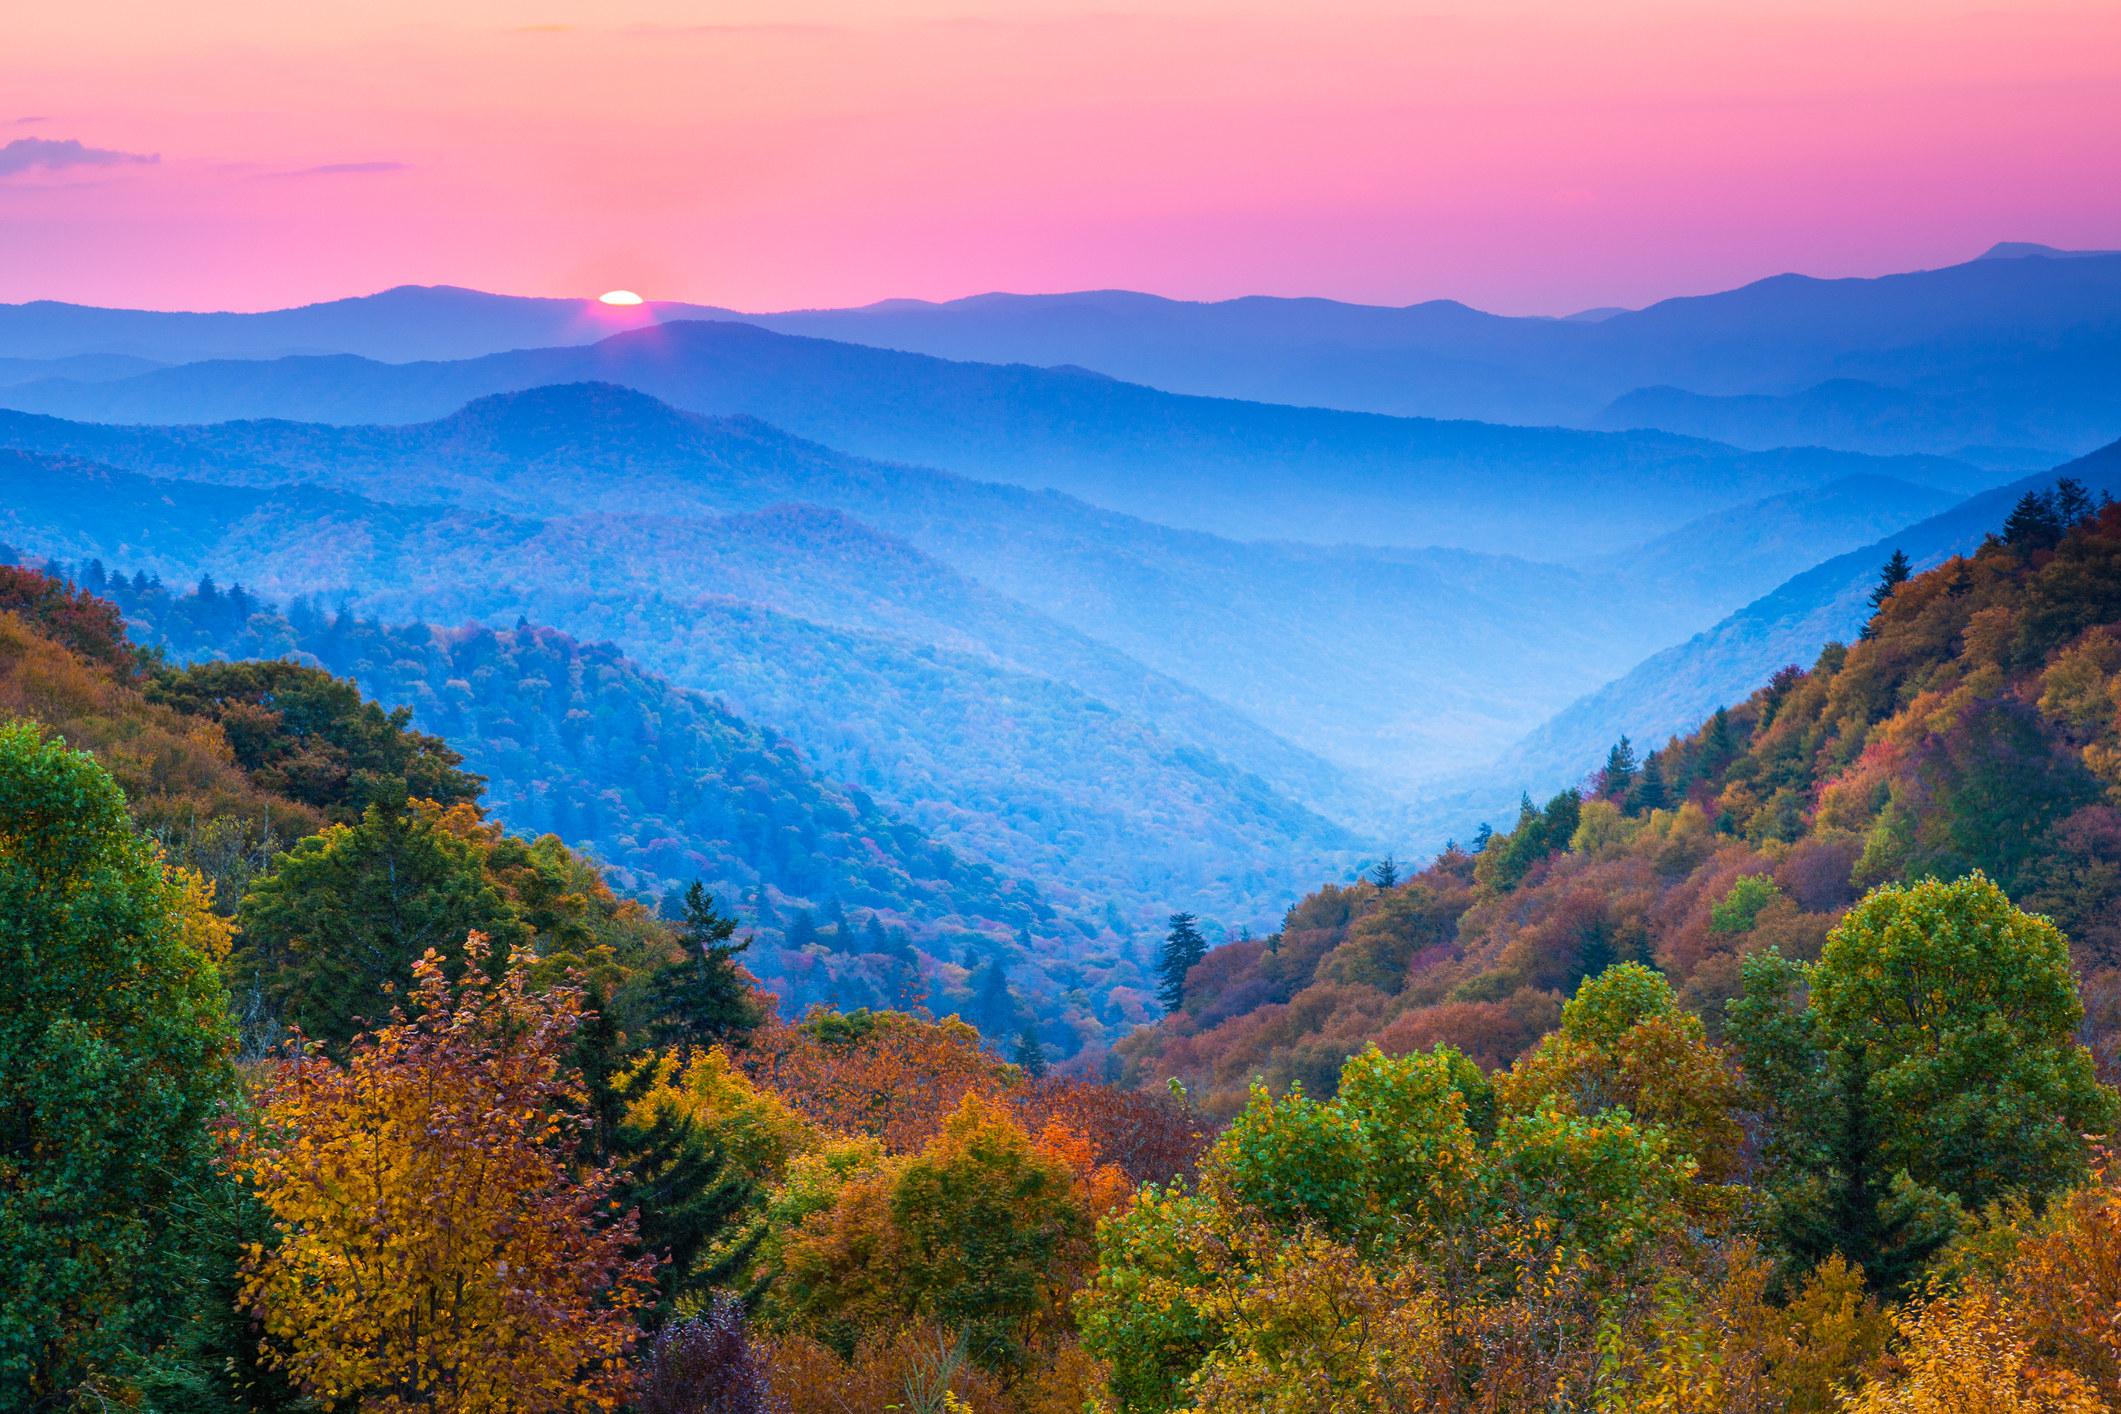 The sun setting over the mountain range